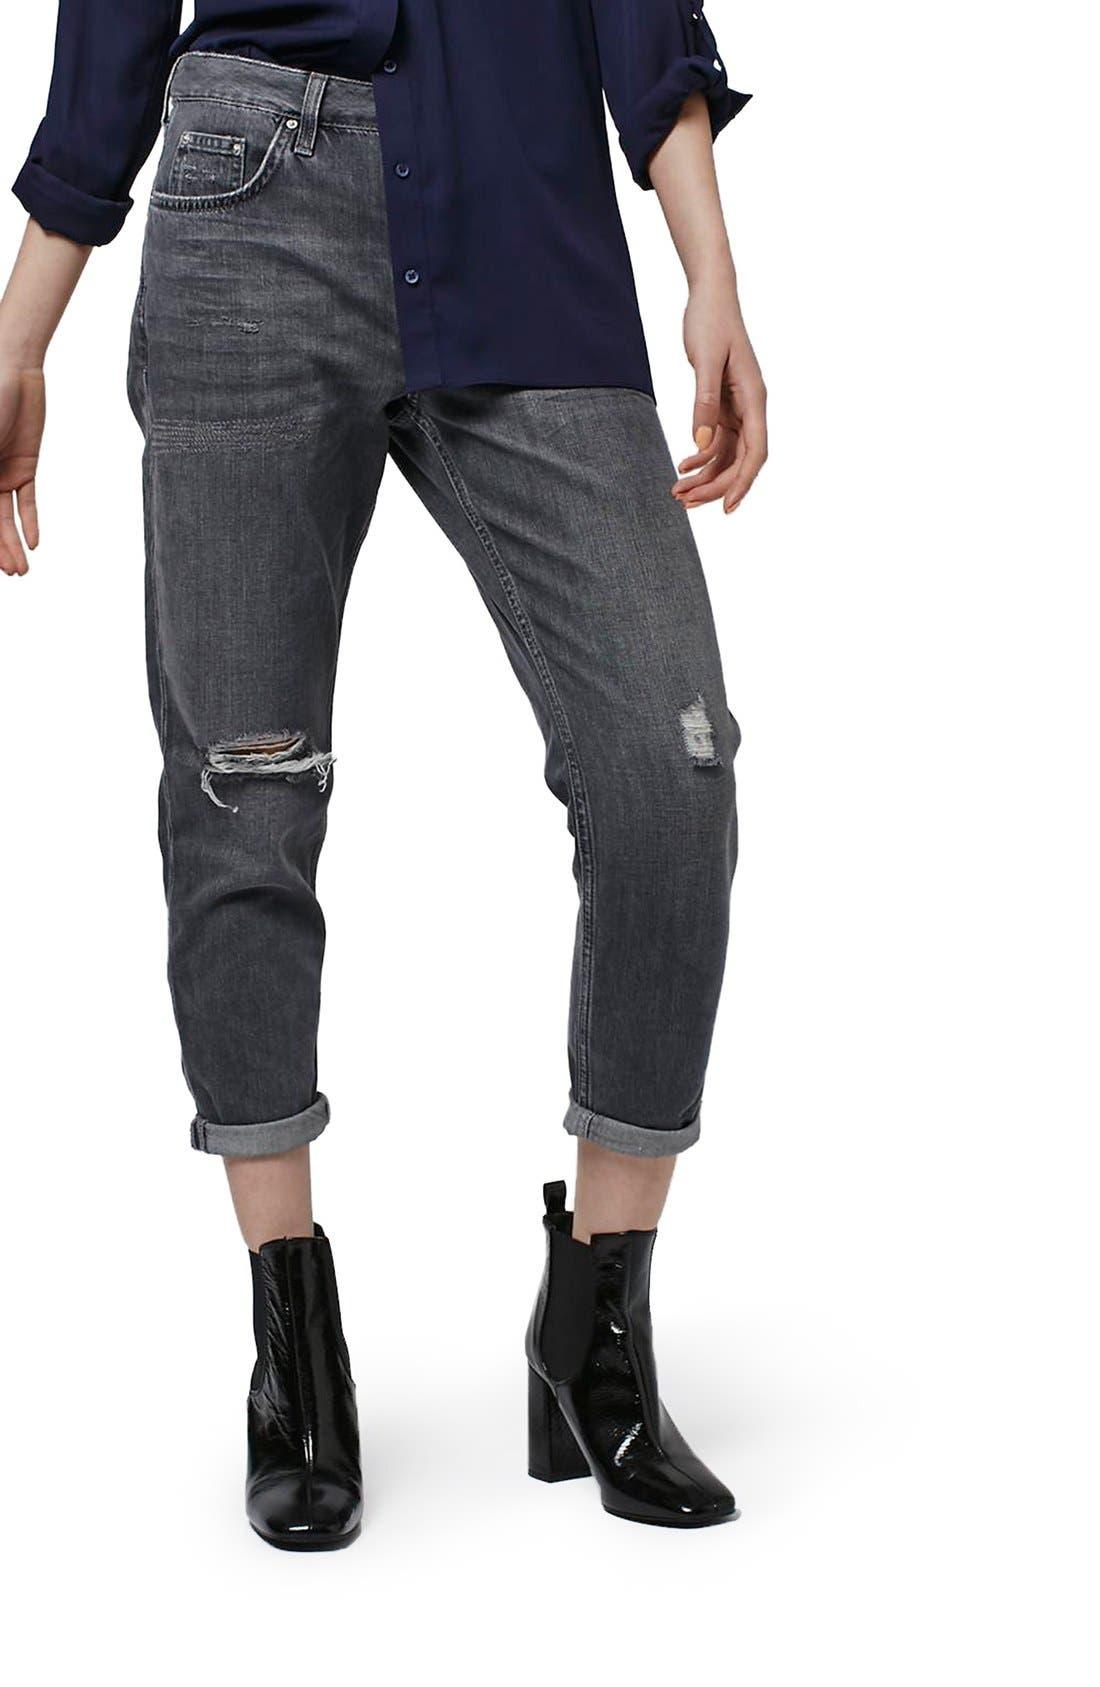 Alternate Image 1 Selected - Topshop Moto 'Hayden' Ripped Boyfriend Jeans (Petite)